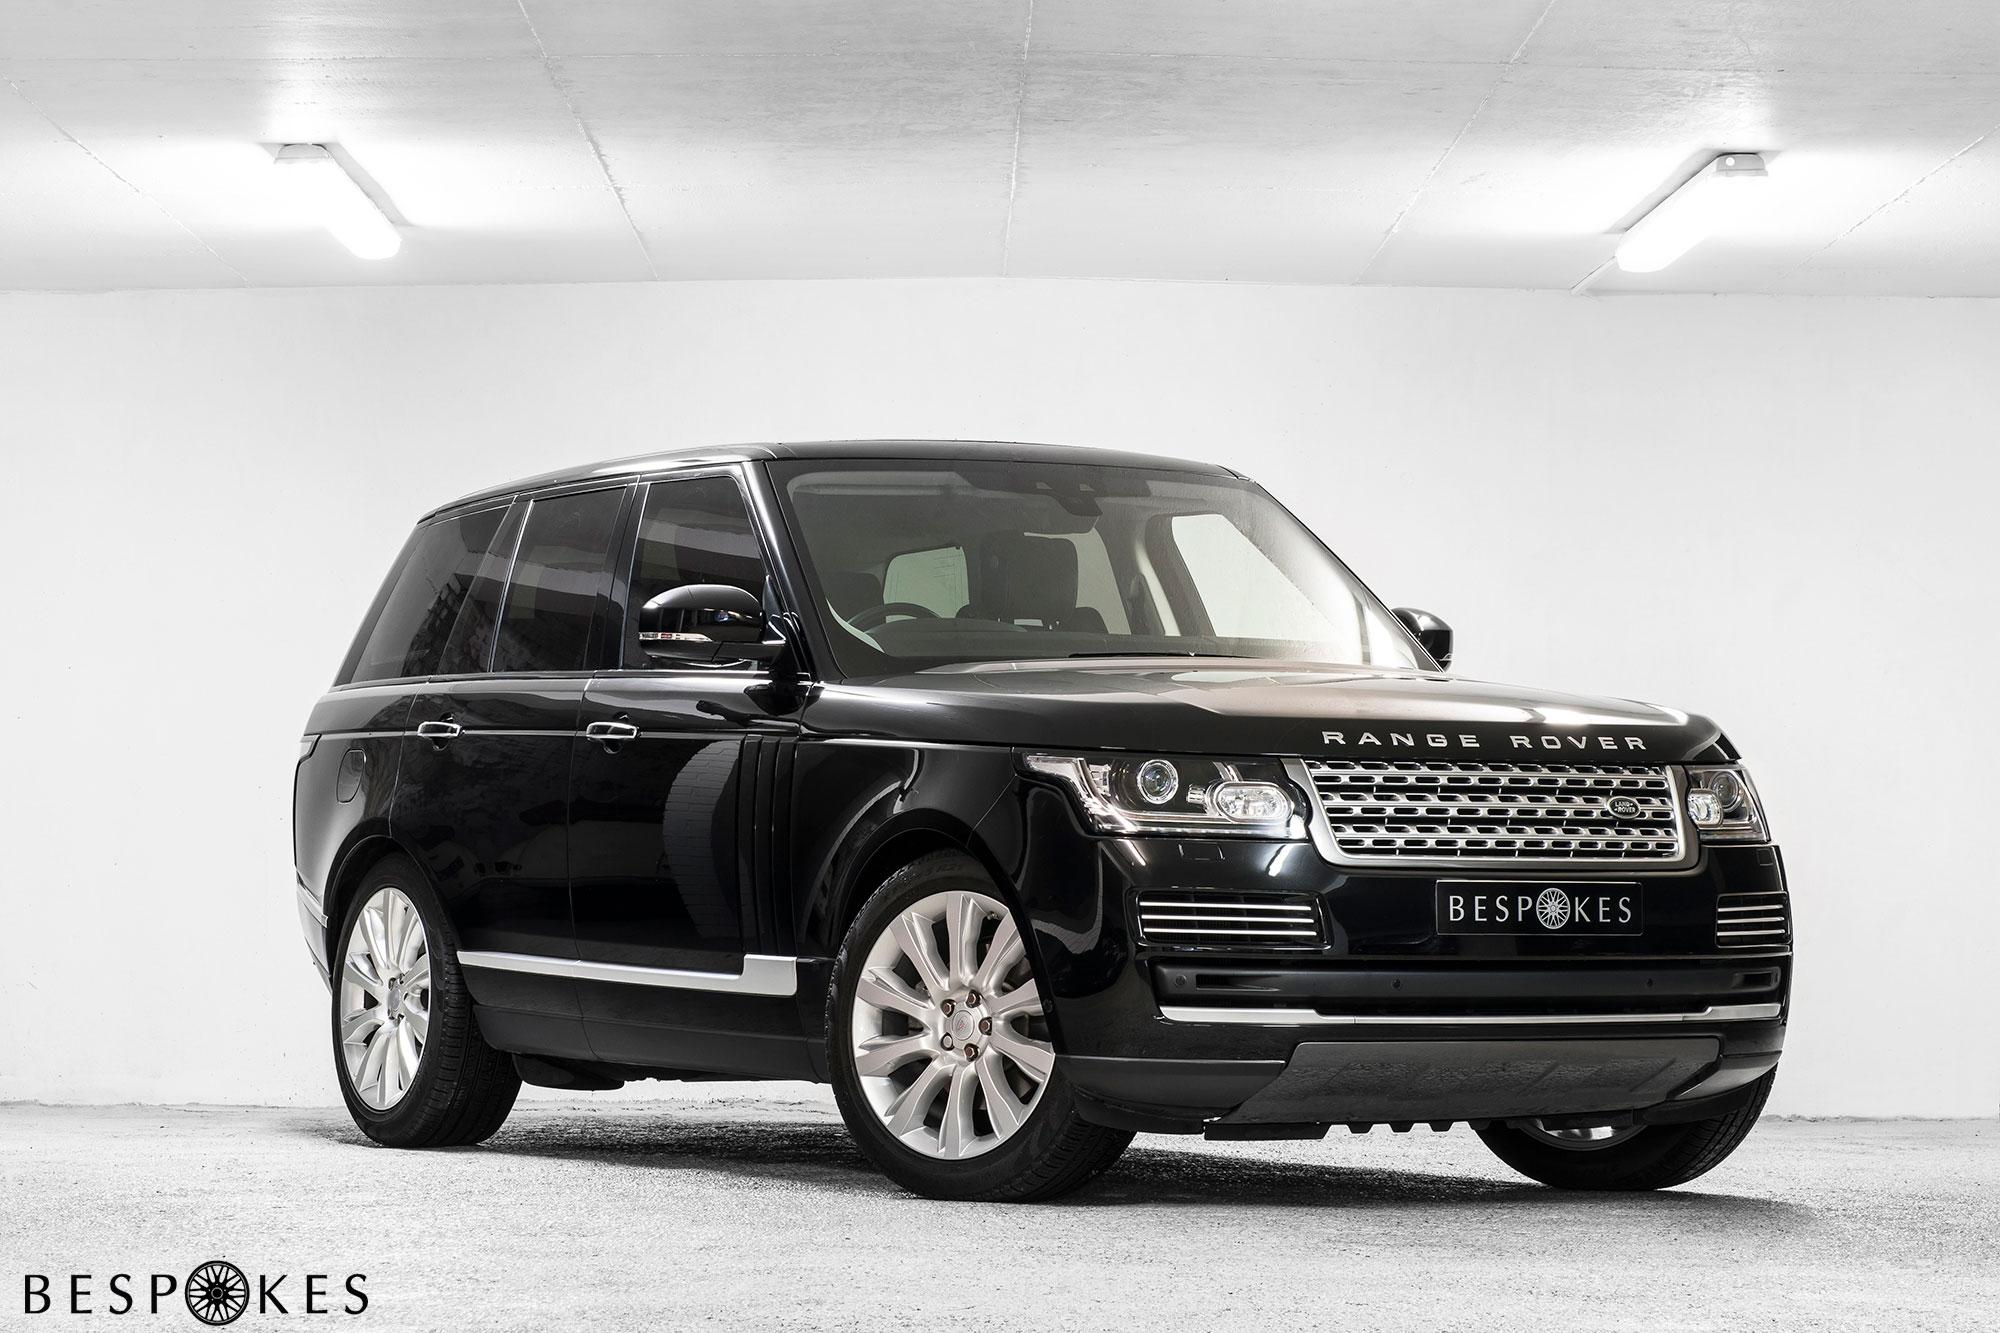 Range Rover Vogue Se Bespokes